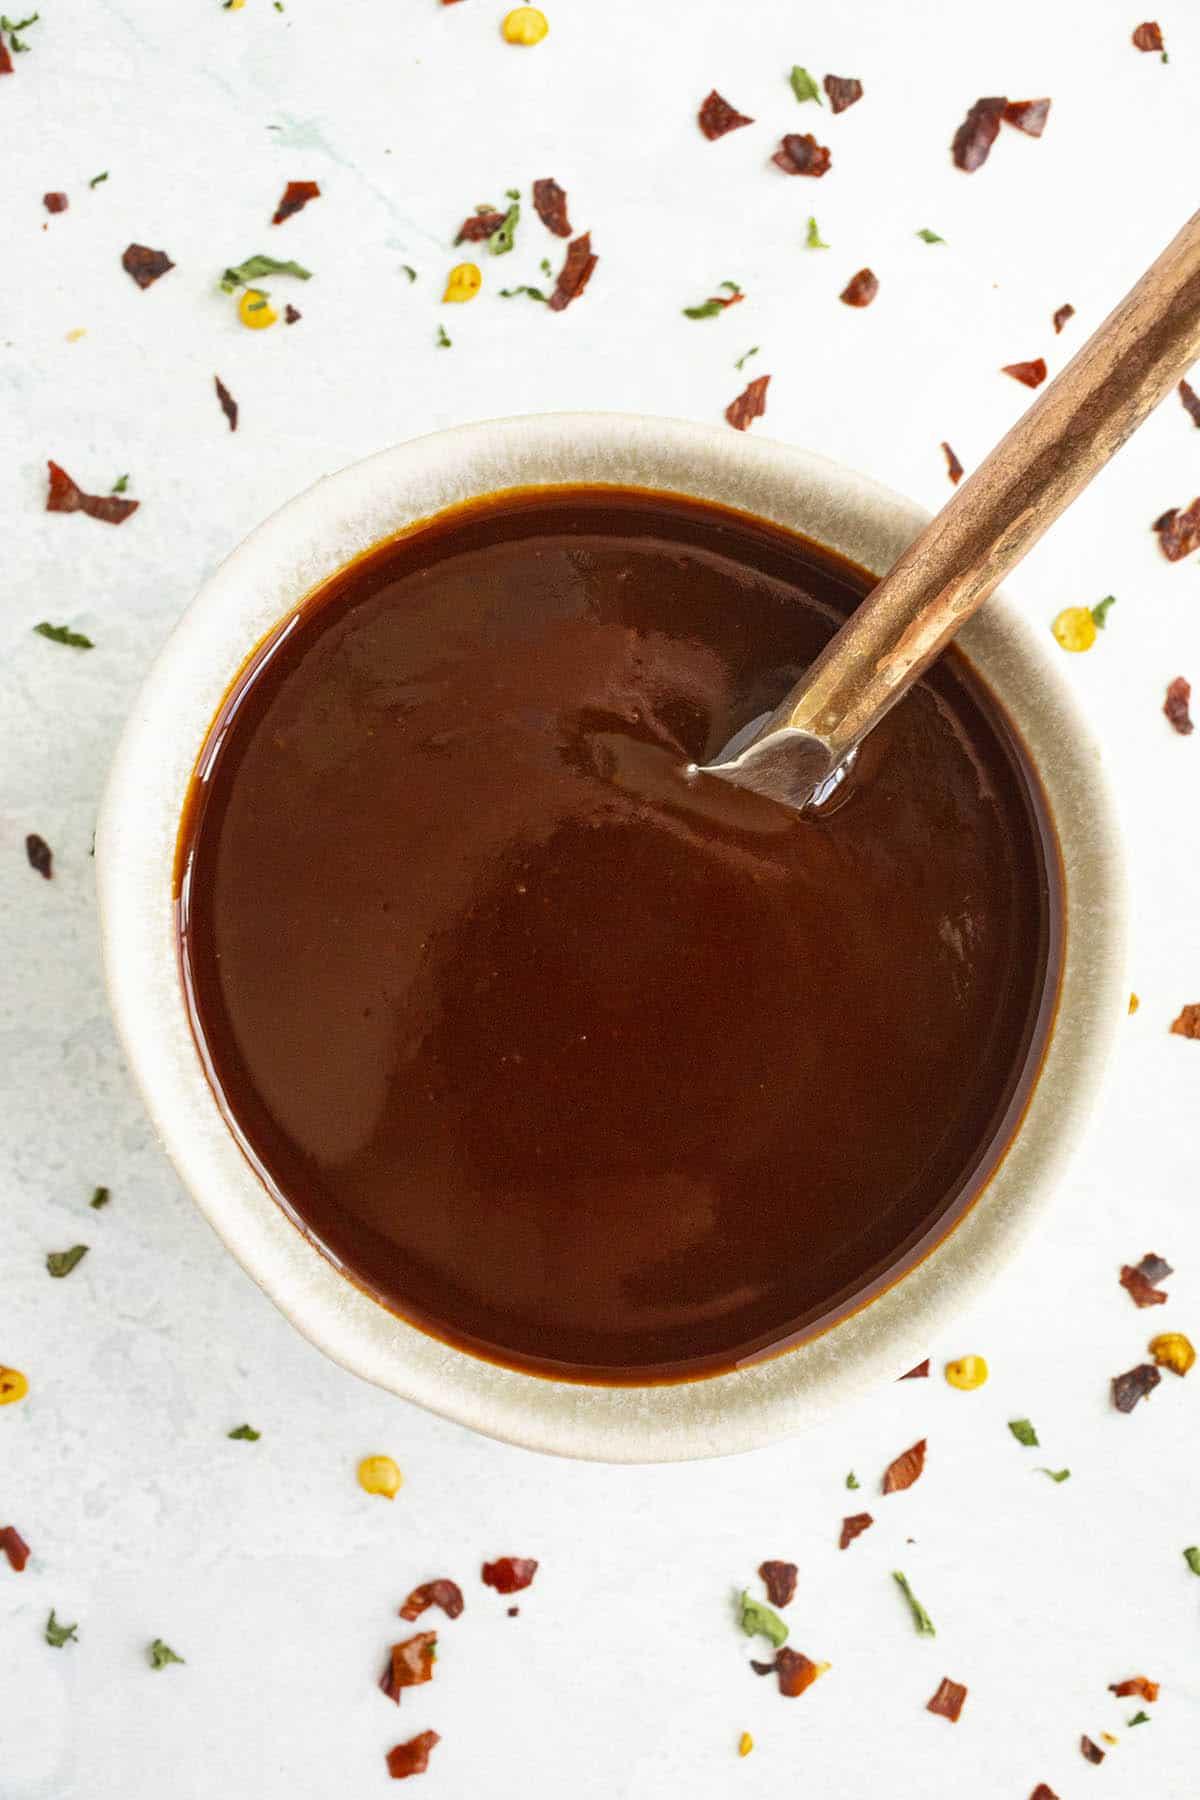 Gochujang Sauce in a bowl